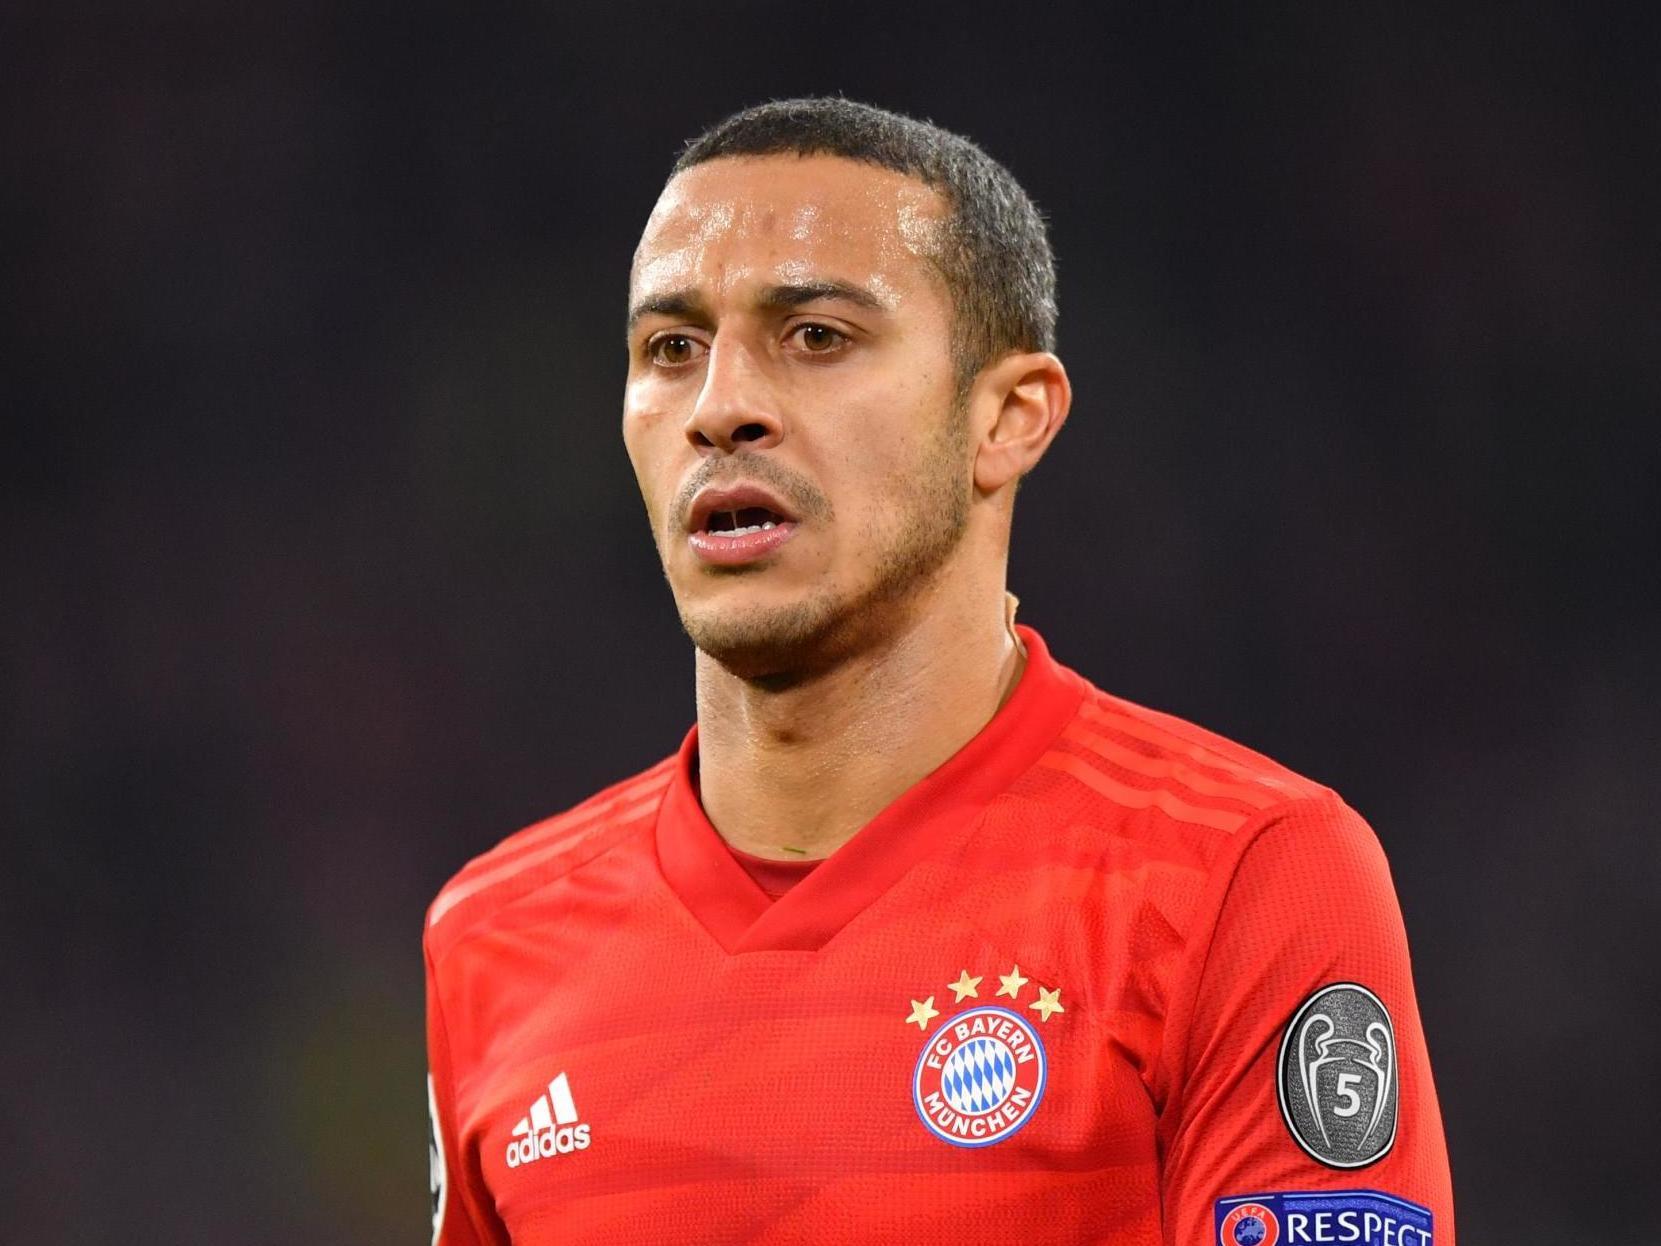 Bayern Munich team news: Thiago Alcantara to miss clash with Borussia Dortmund